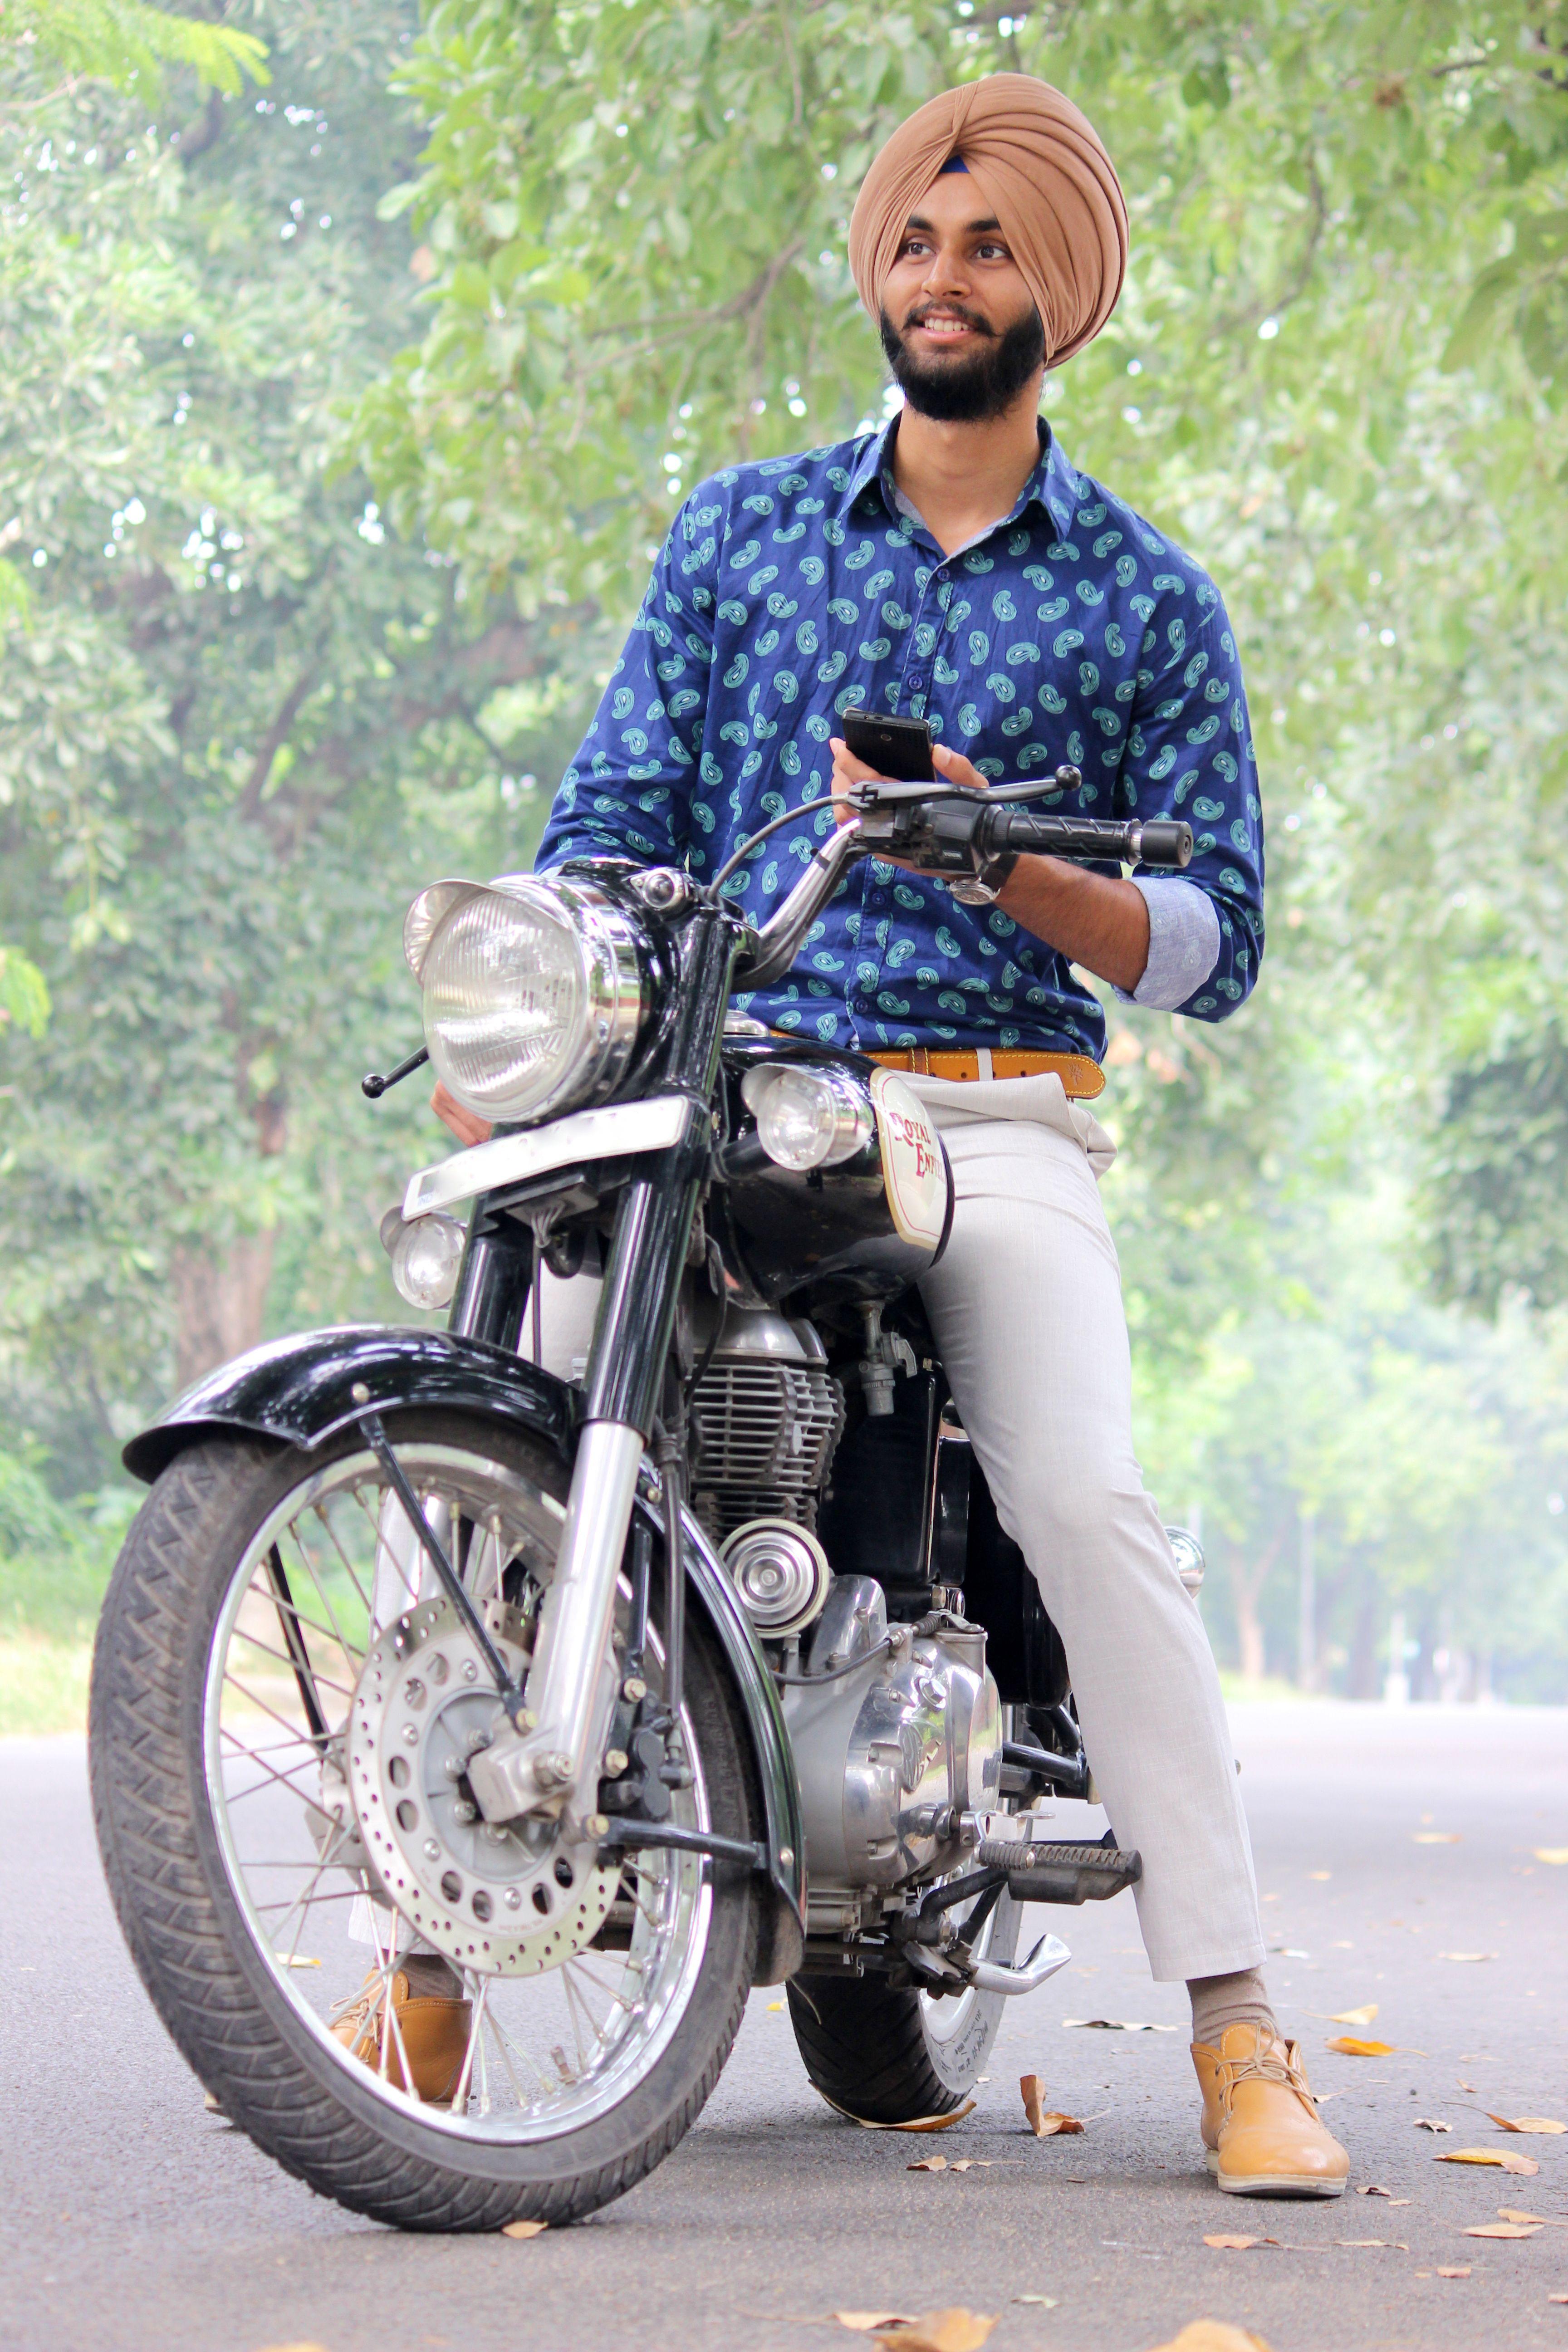 mensfashion menswear street style mens urban sardar turban Sikh Singh Pagg turban blueshirt whitepants brownturban